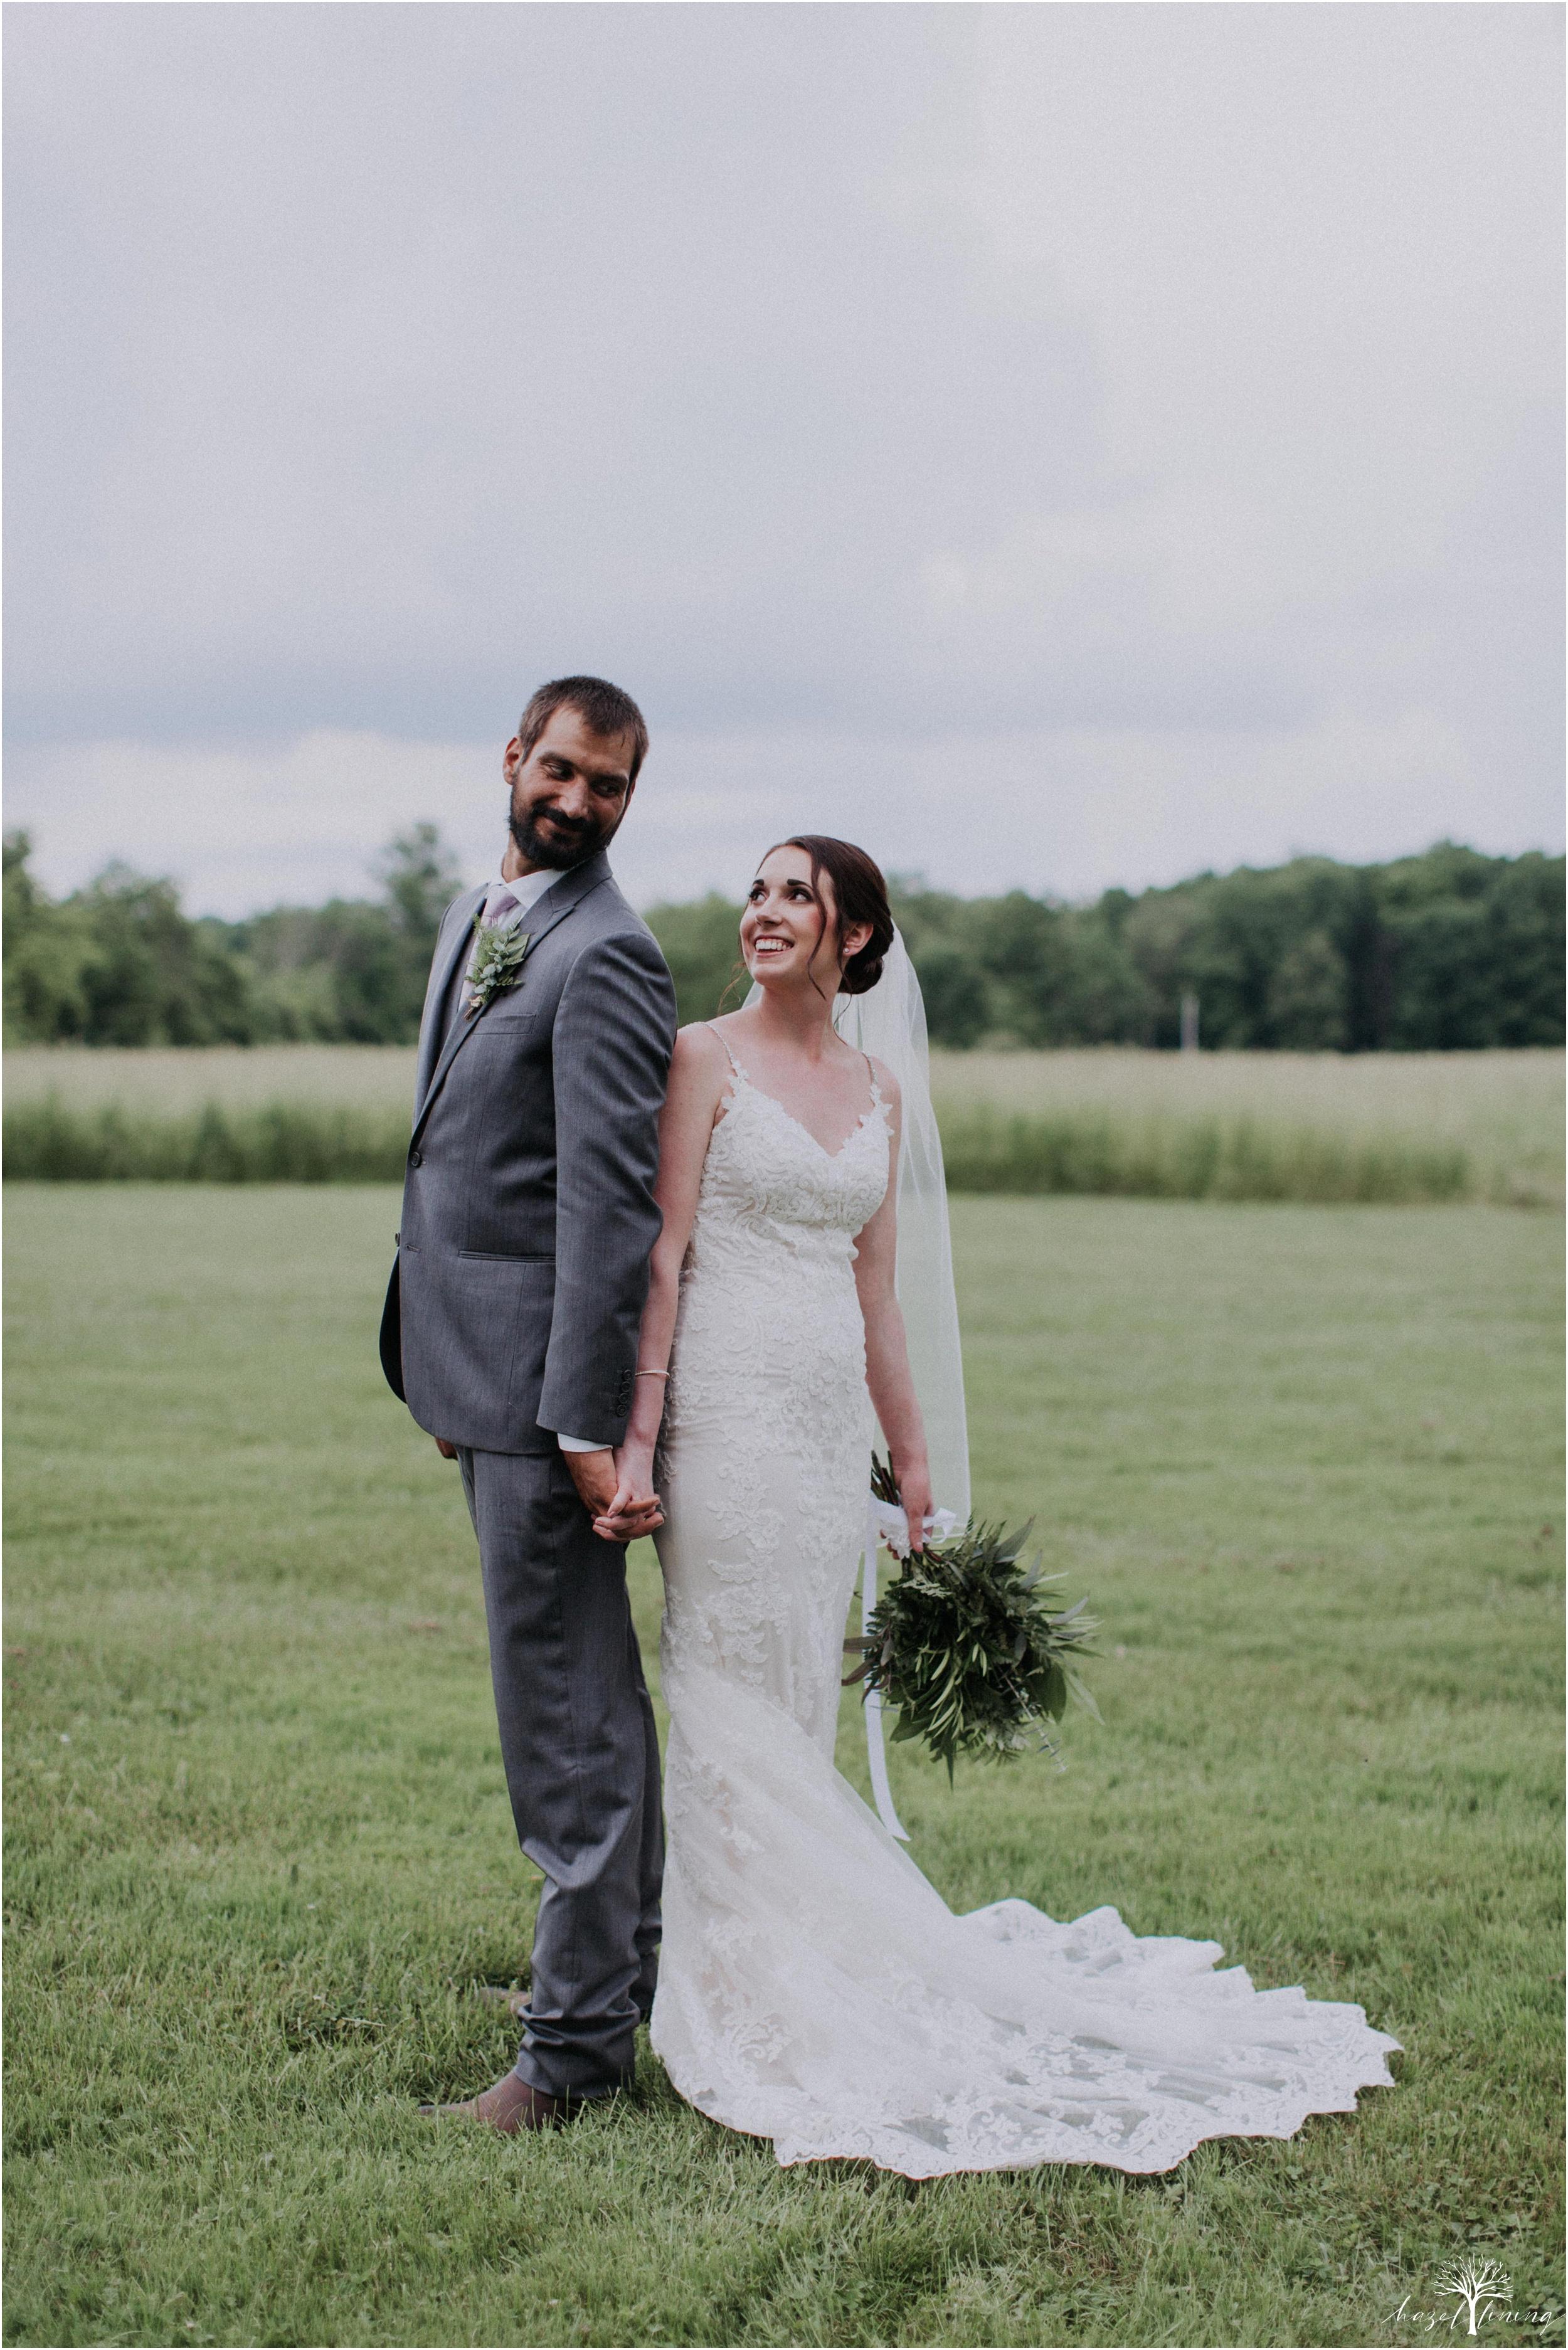 hazel-lining-travel-wedding-elopement-photography-lisa-landon-shoemaker-the-farm-bakery-and-events-bucks-county-quakertown-pennsylvania-summer-country-outdoor-farm-wedding_0090.jpg